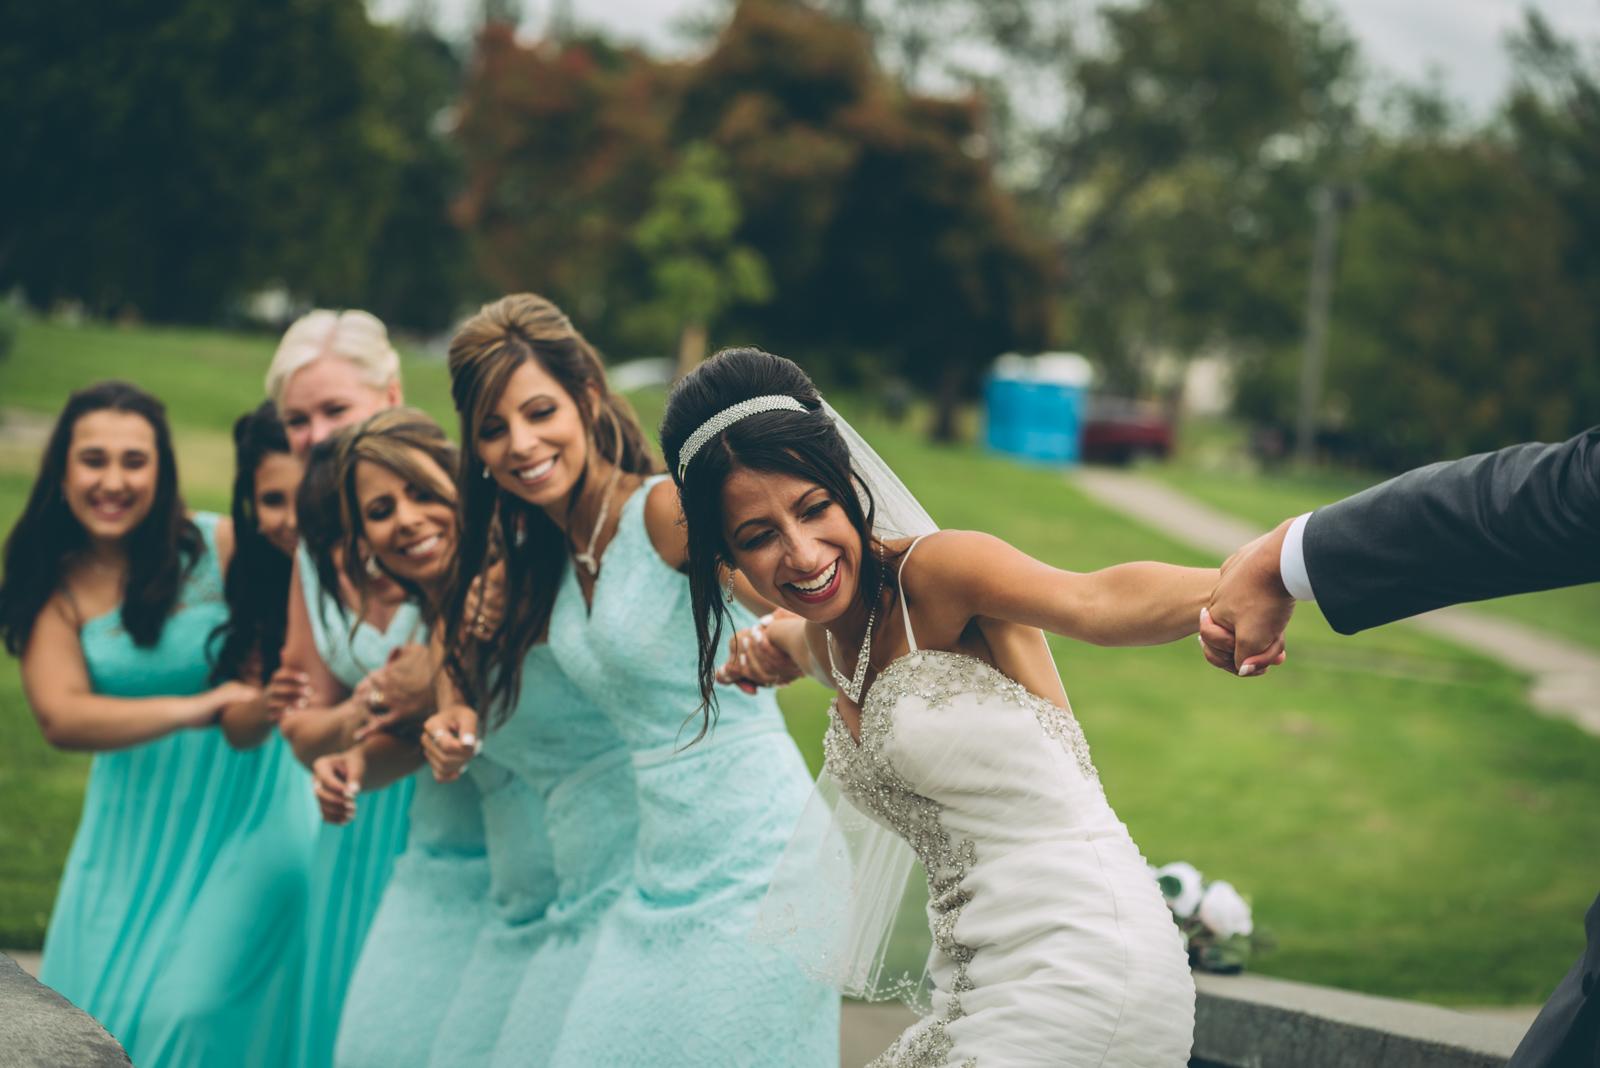 top-wedding-photos-2018-blog-72.jpg